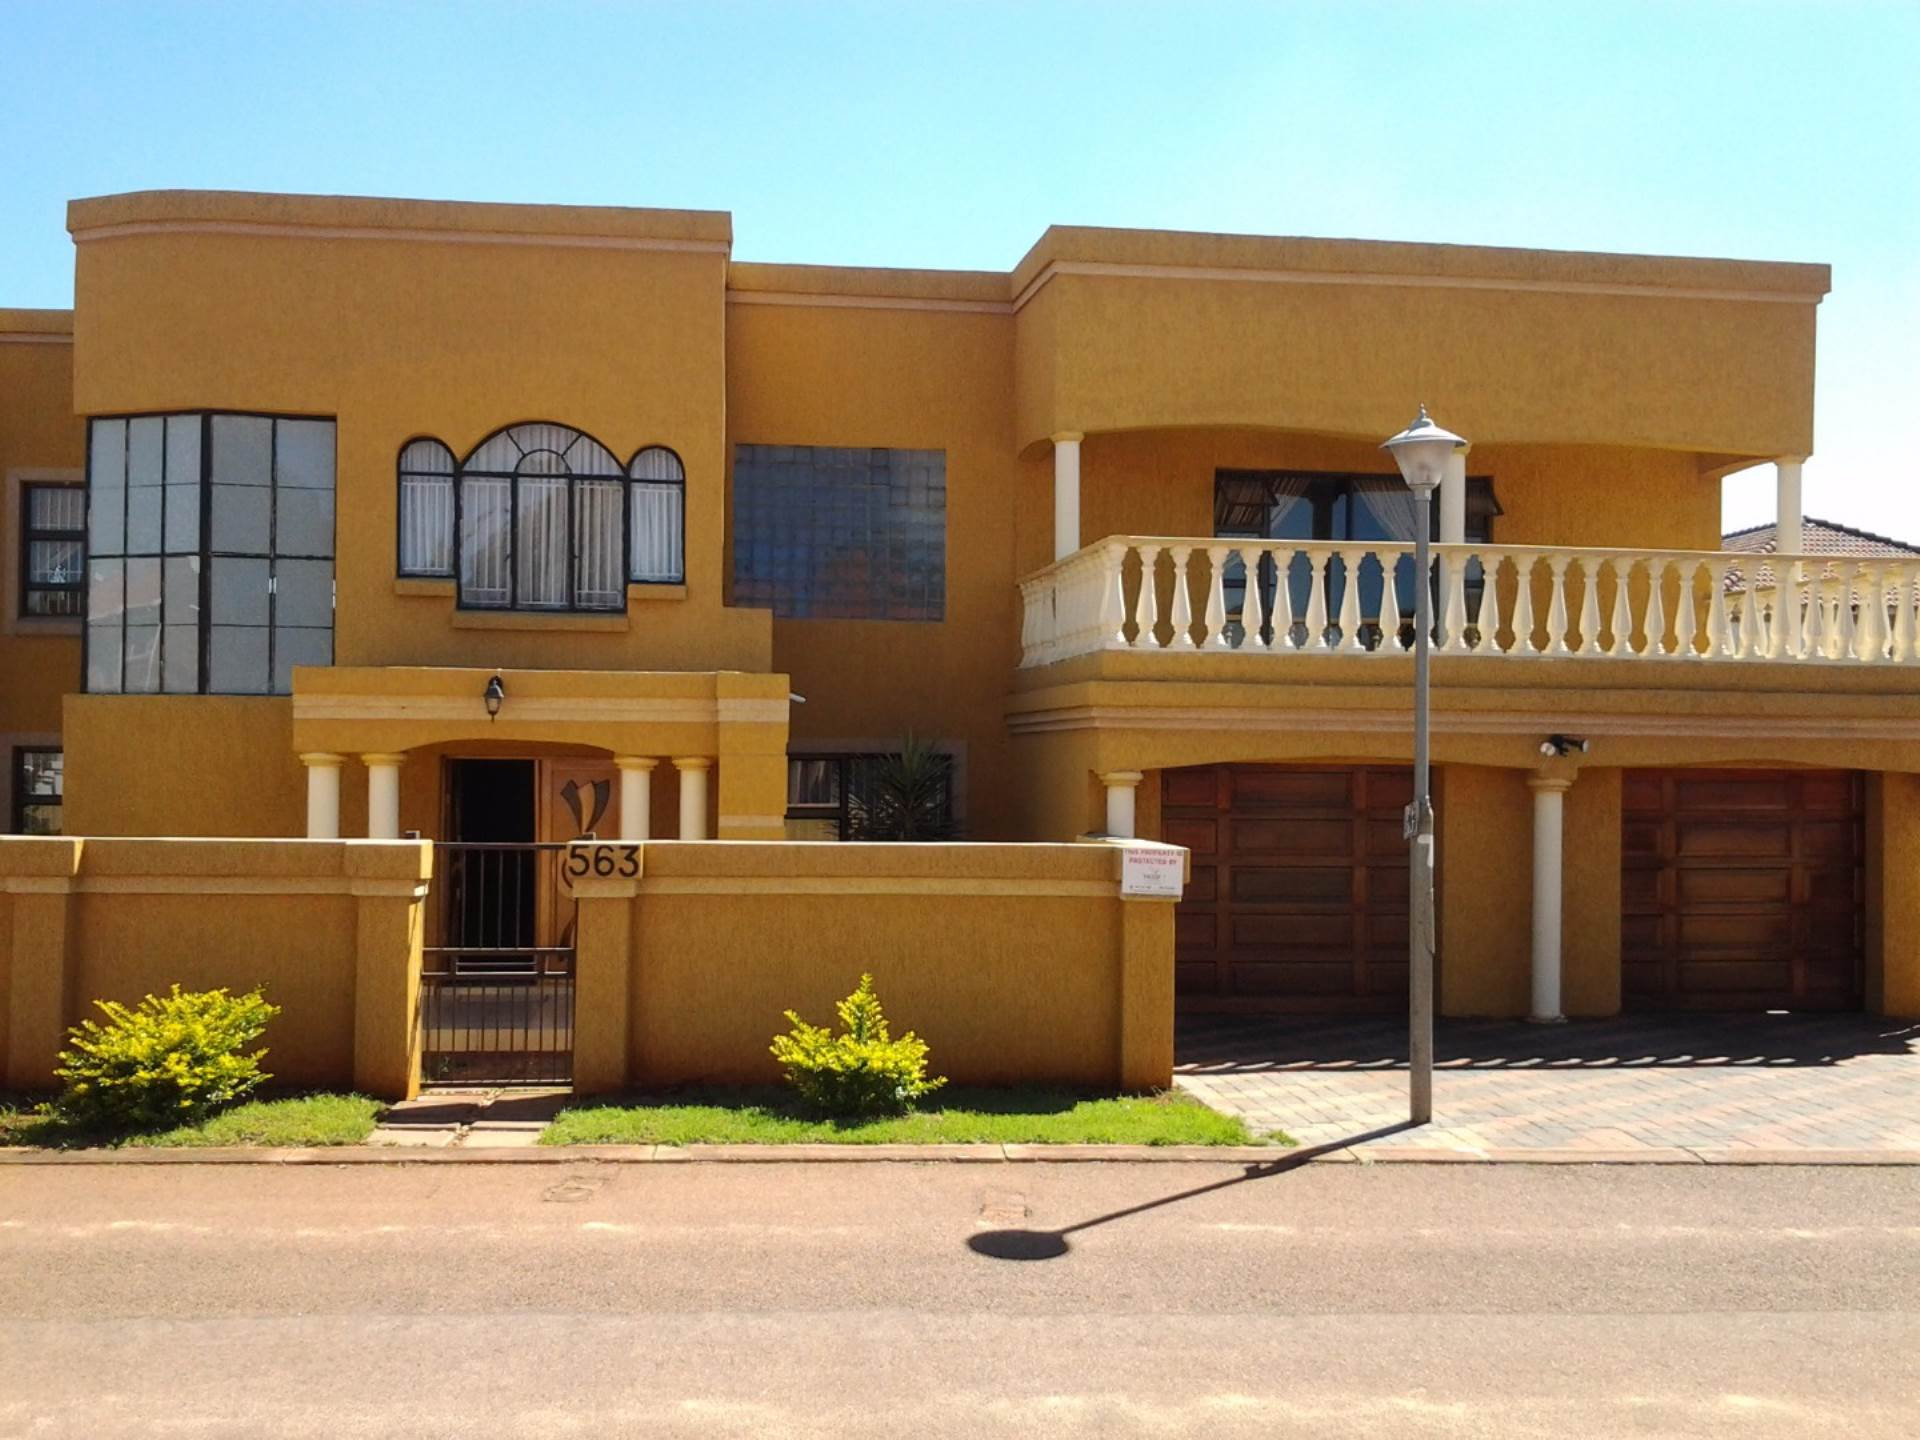 4 BedroomHouse To Rent In Clarina